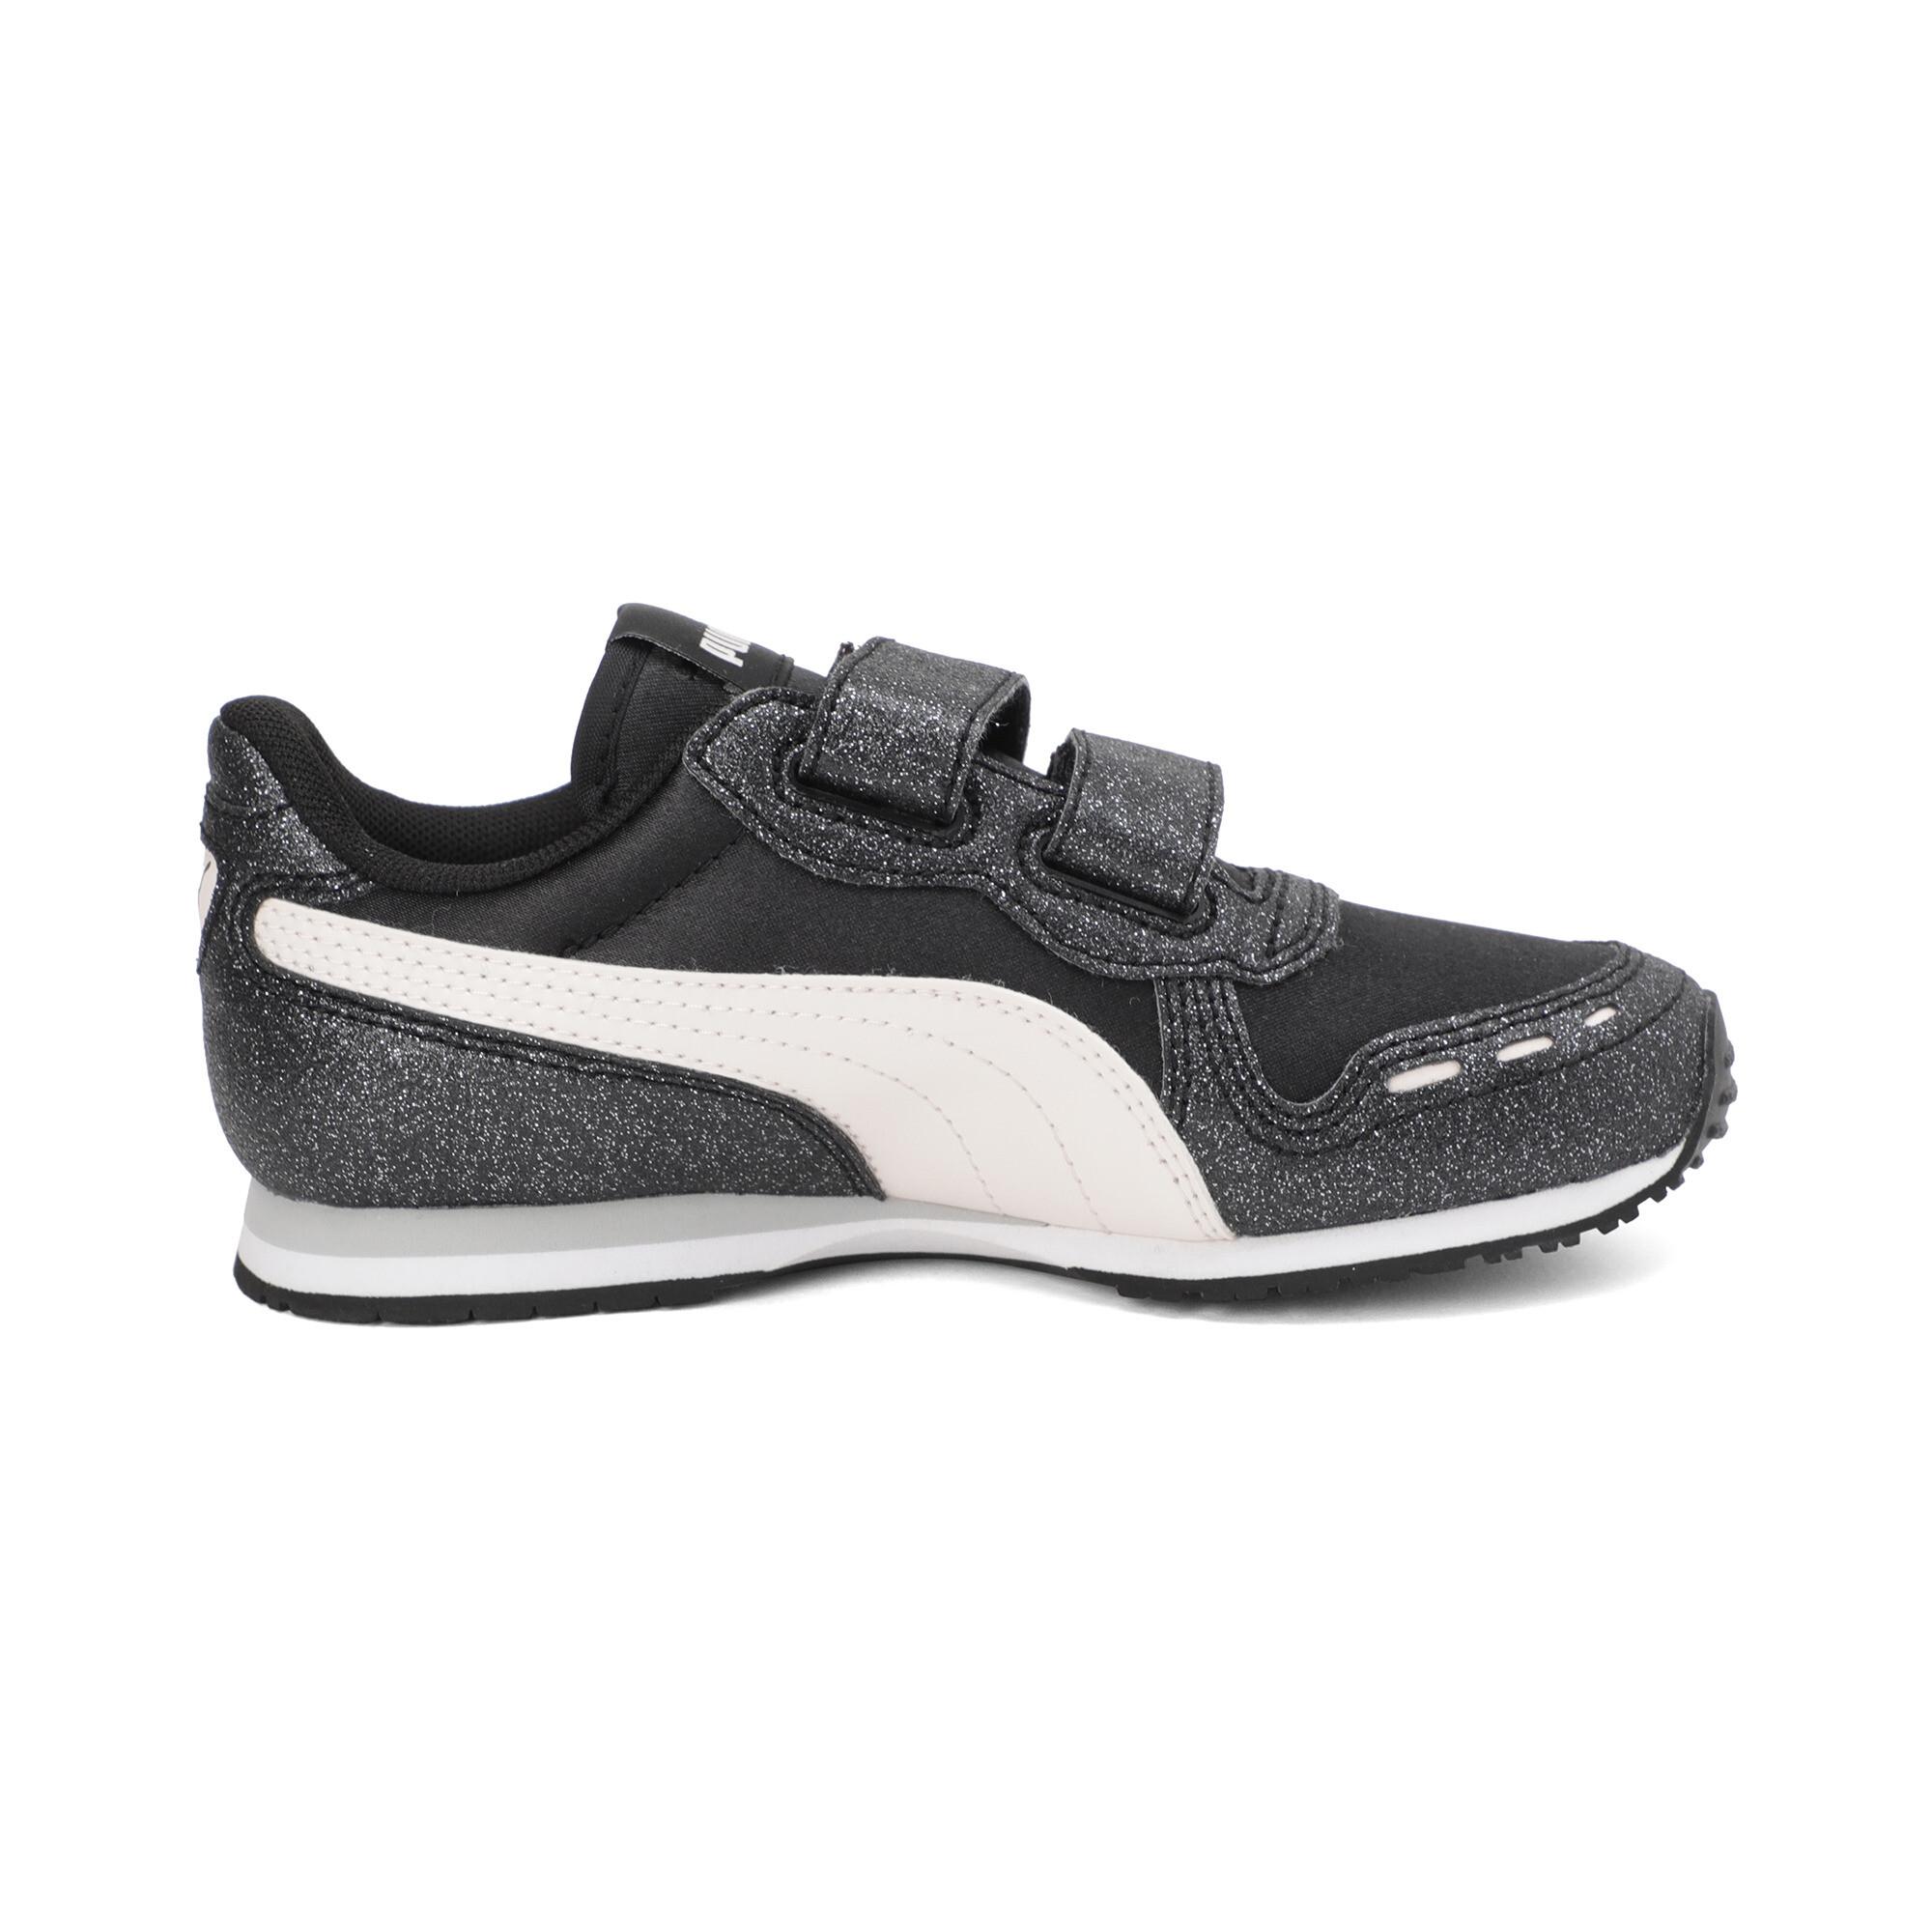 PUMA-Pre-School-Girl-039-s-Cabana-Racer-Glitz-AC-Shoes thumbnail 18